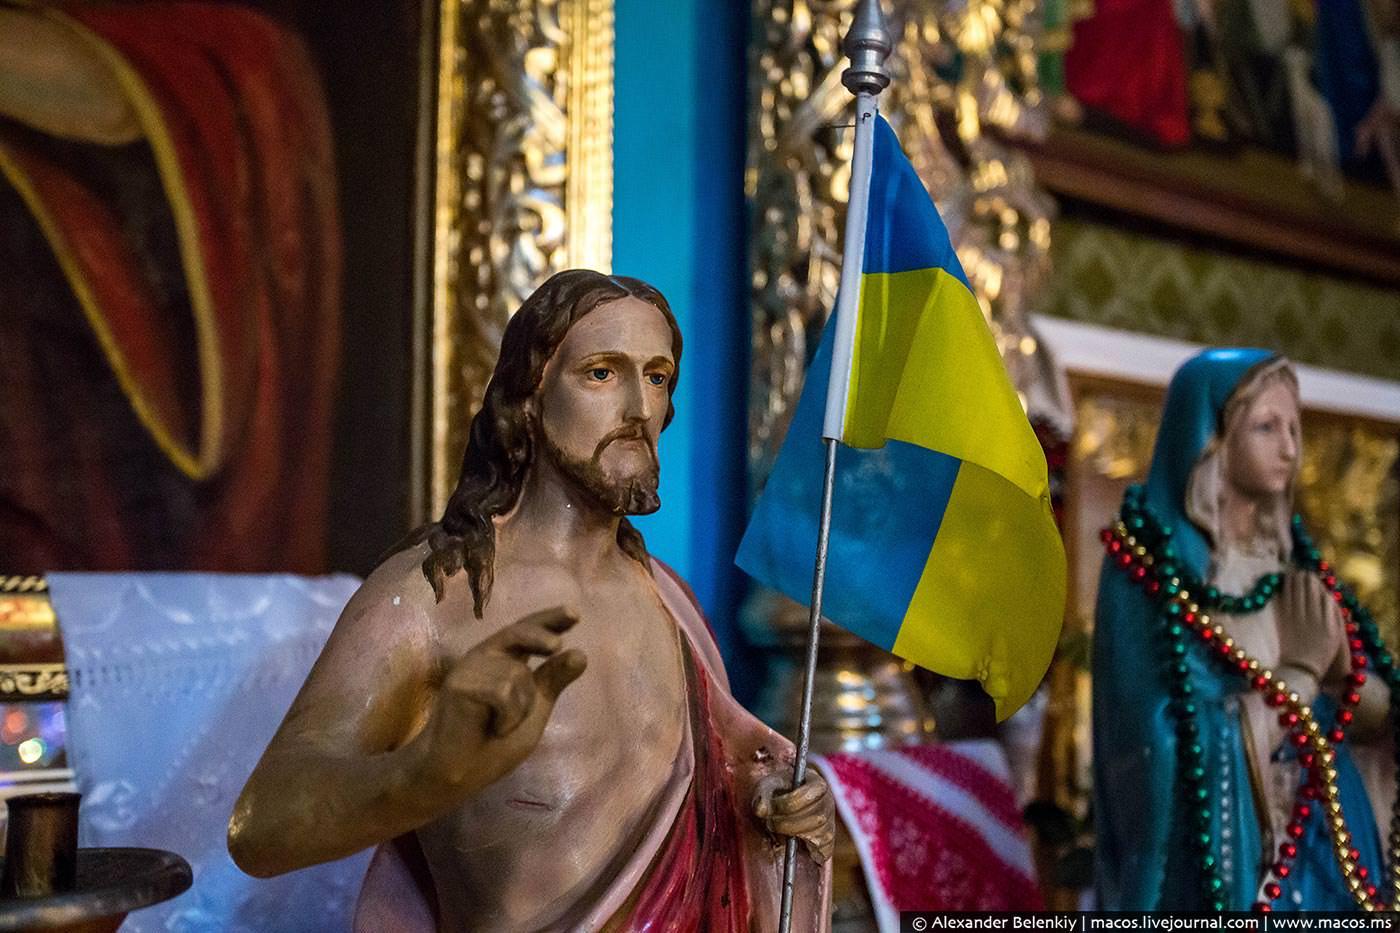 Откреститься от Византии. Православие на грани раскола?